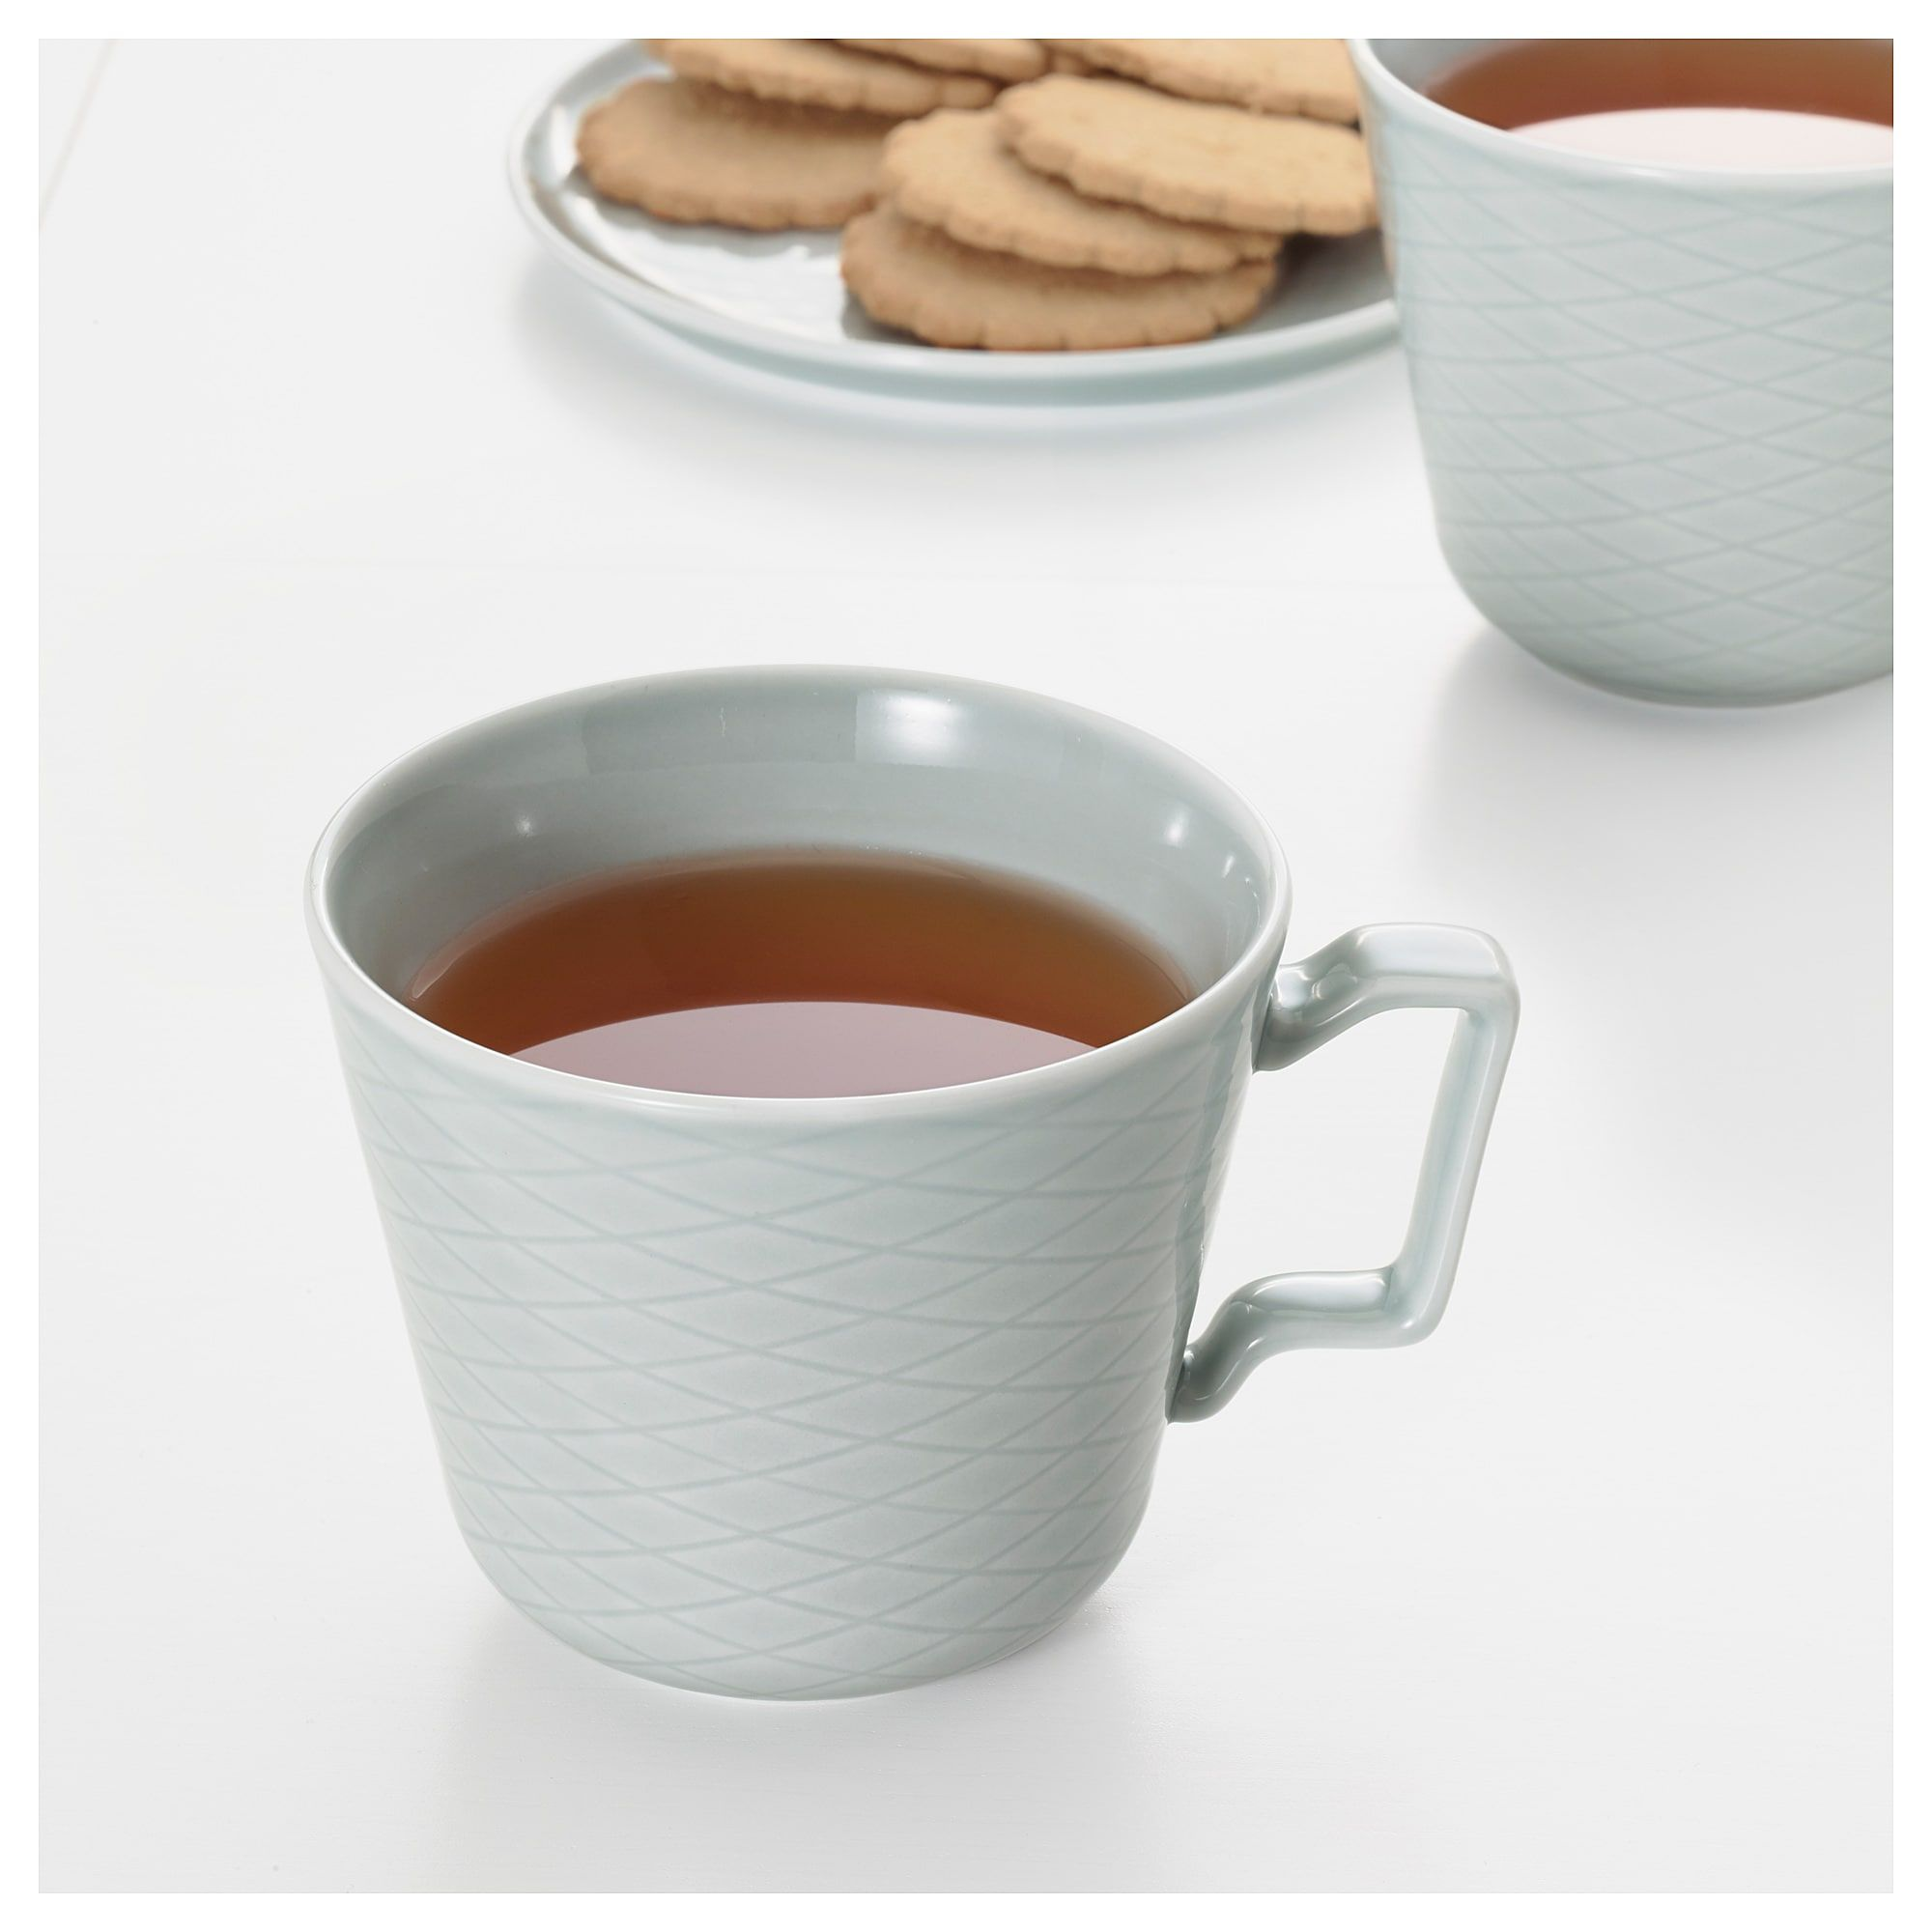 KRUSTAD Mug light gray IKEA in 2020 Mugs, Grey mugs